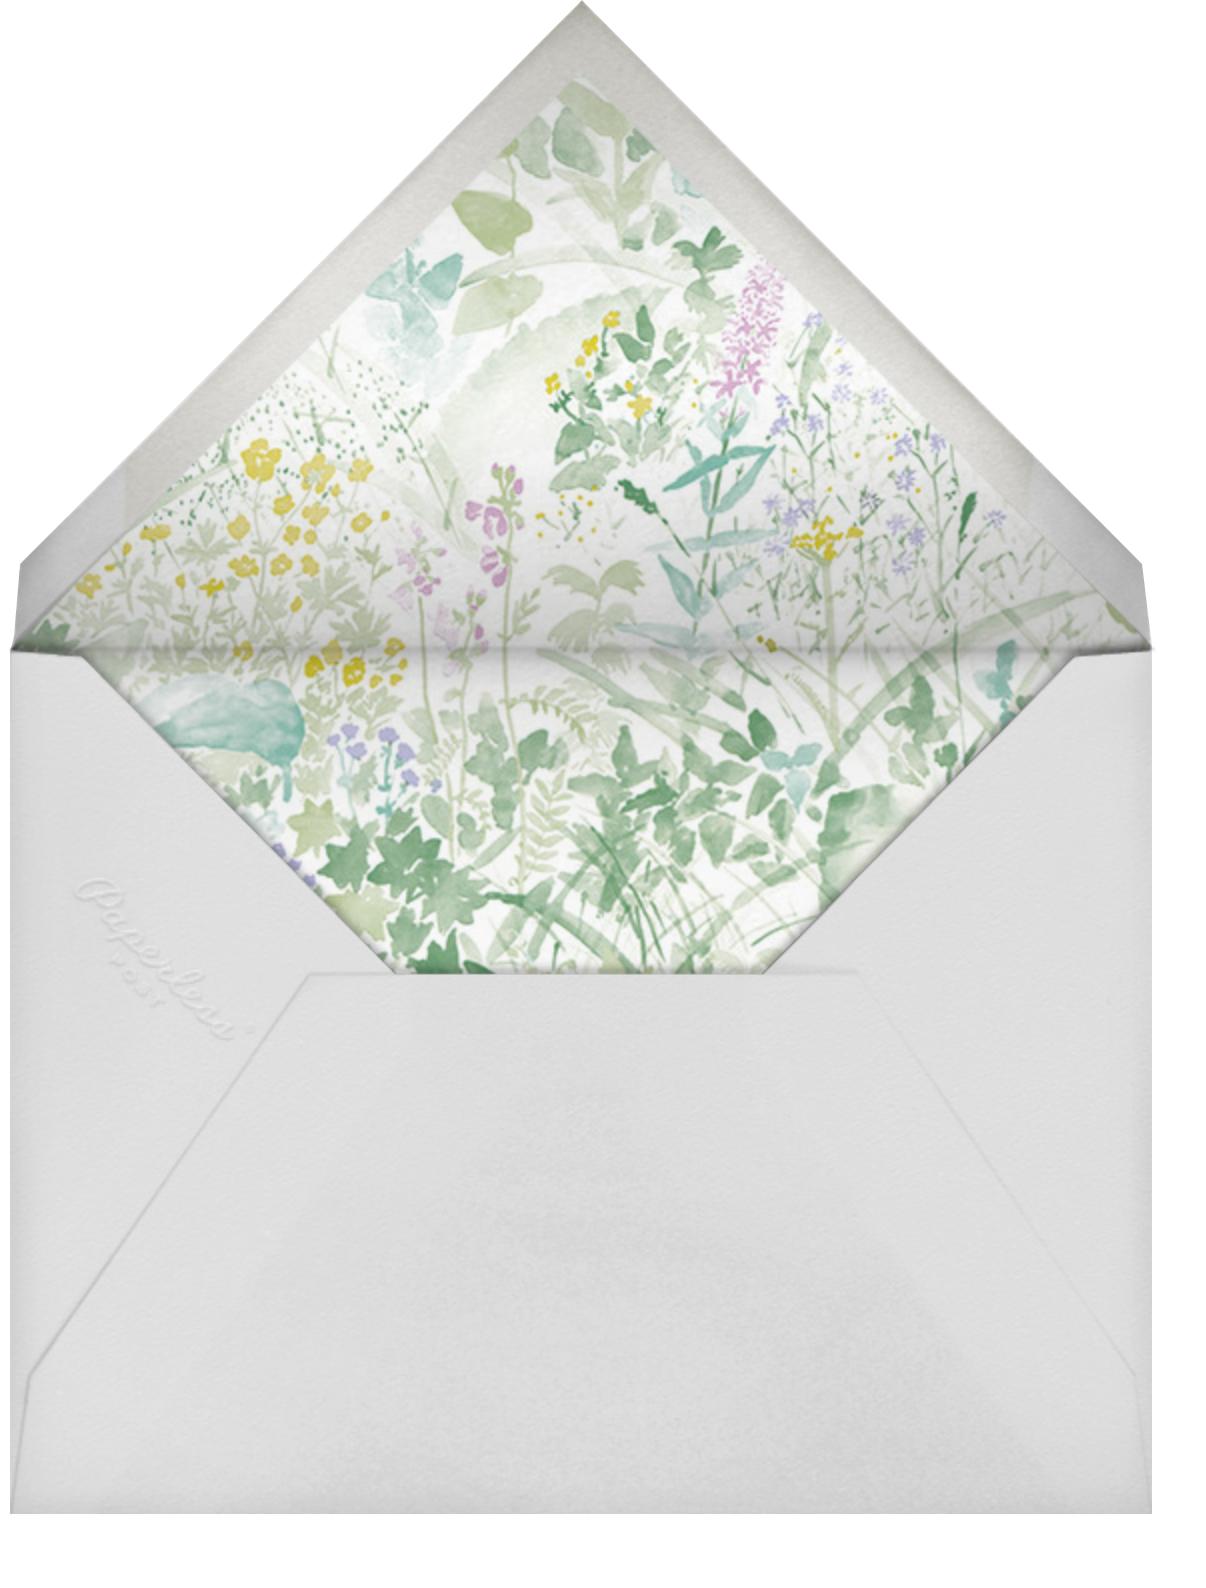 Kesanto (Save the Date) - Marimekko - Save the date - envelope back